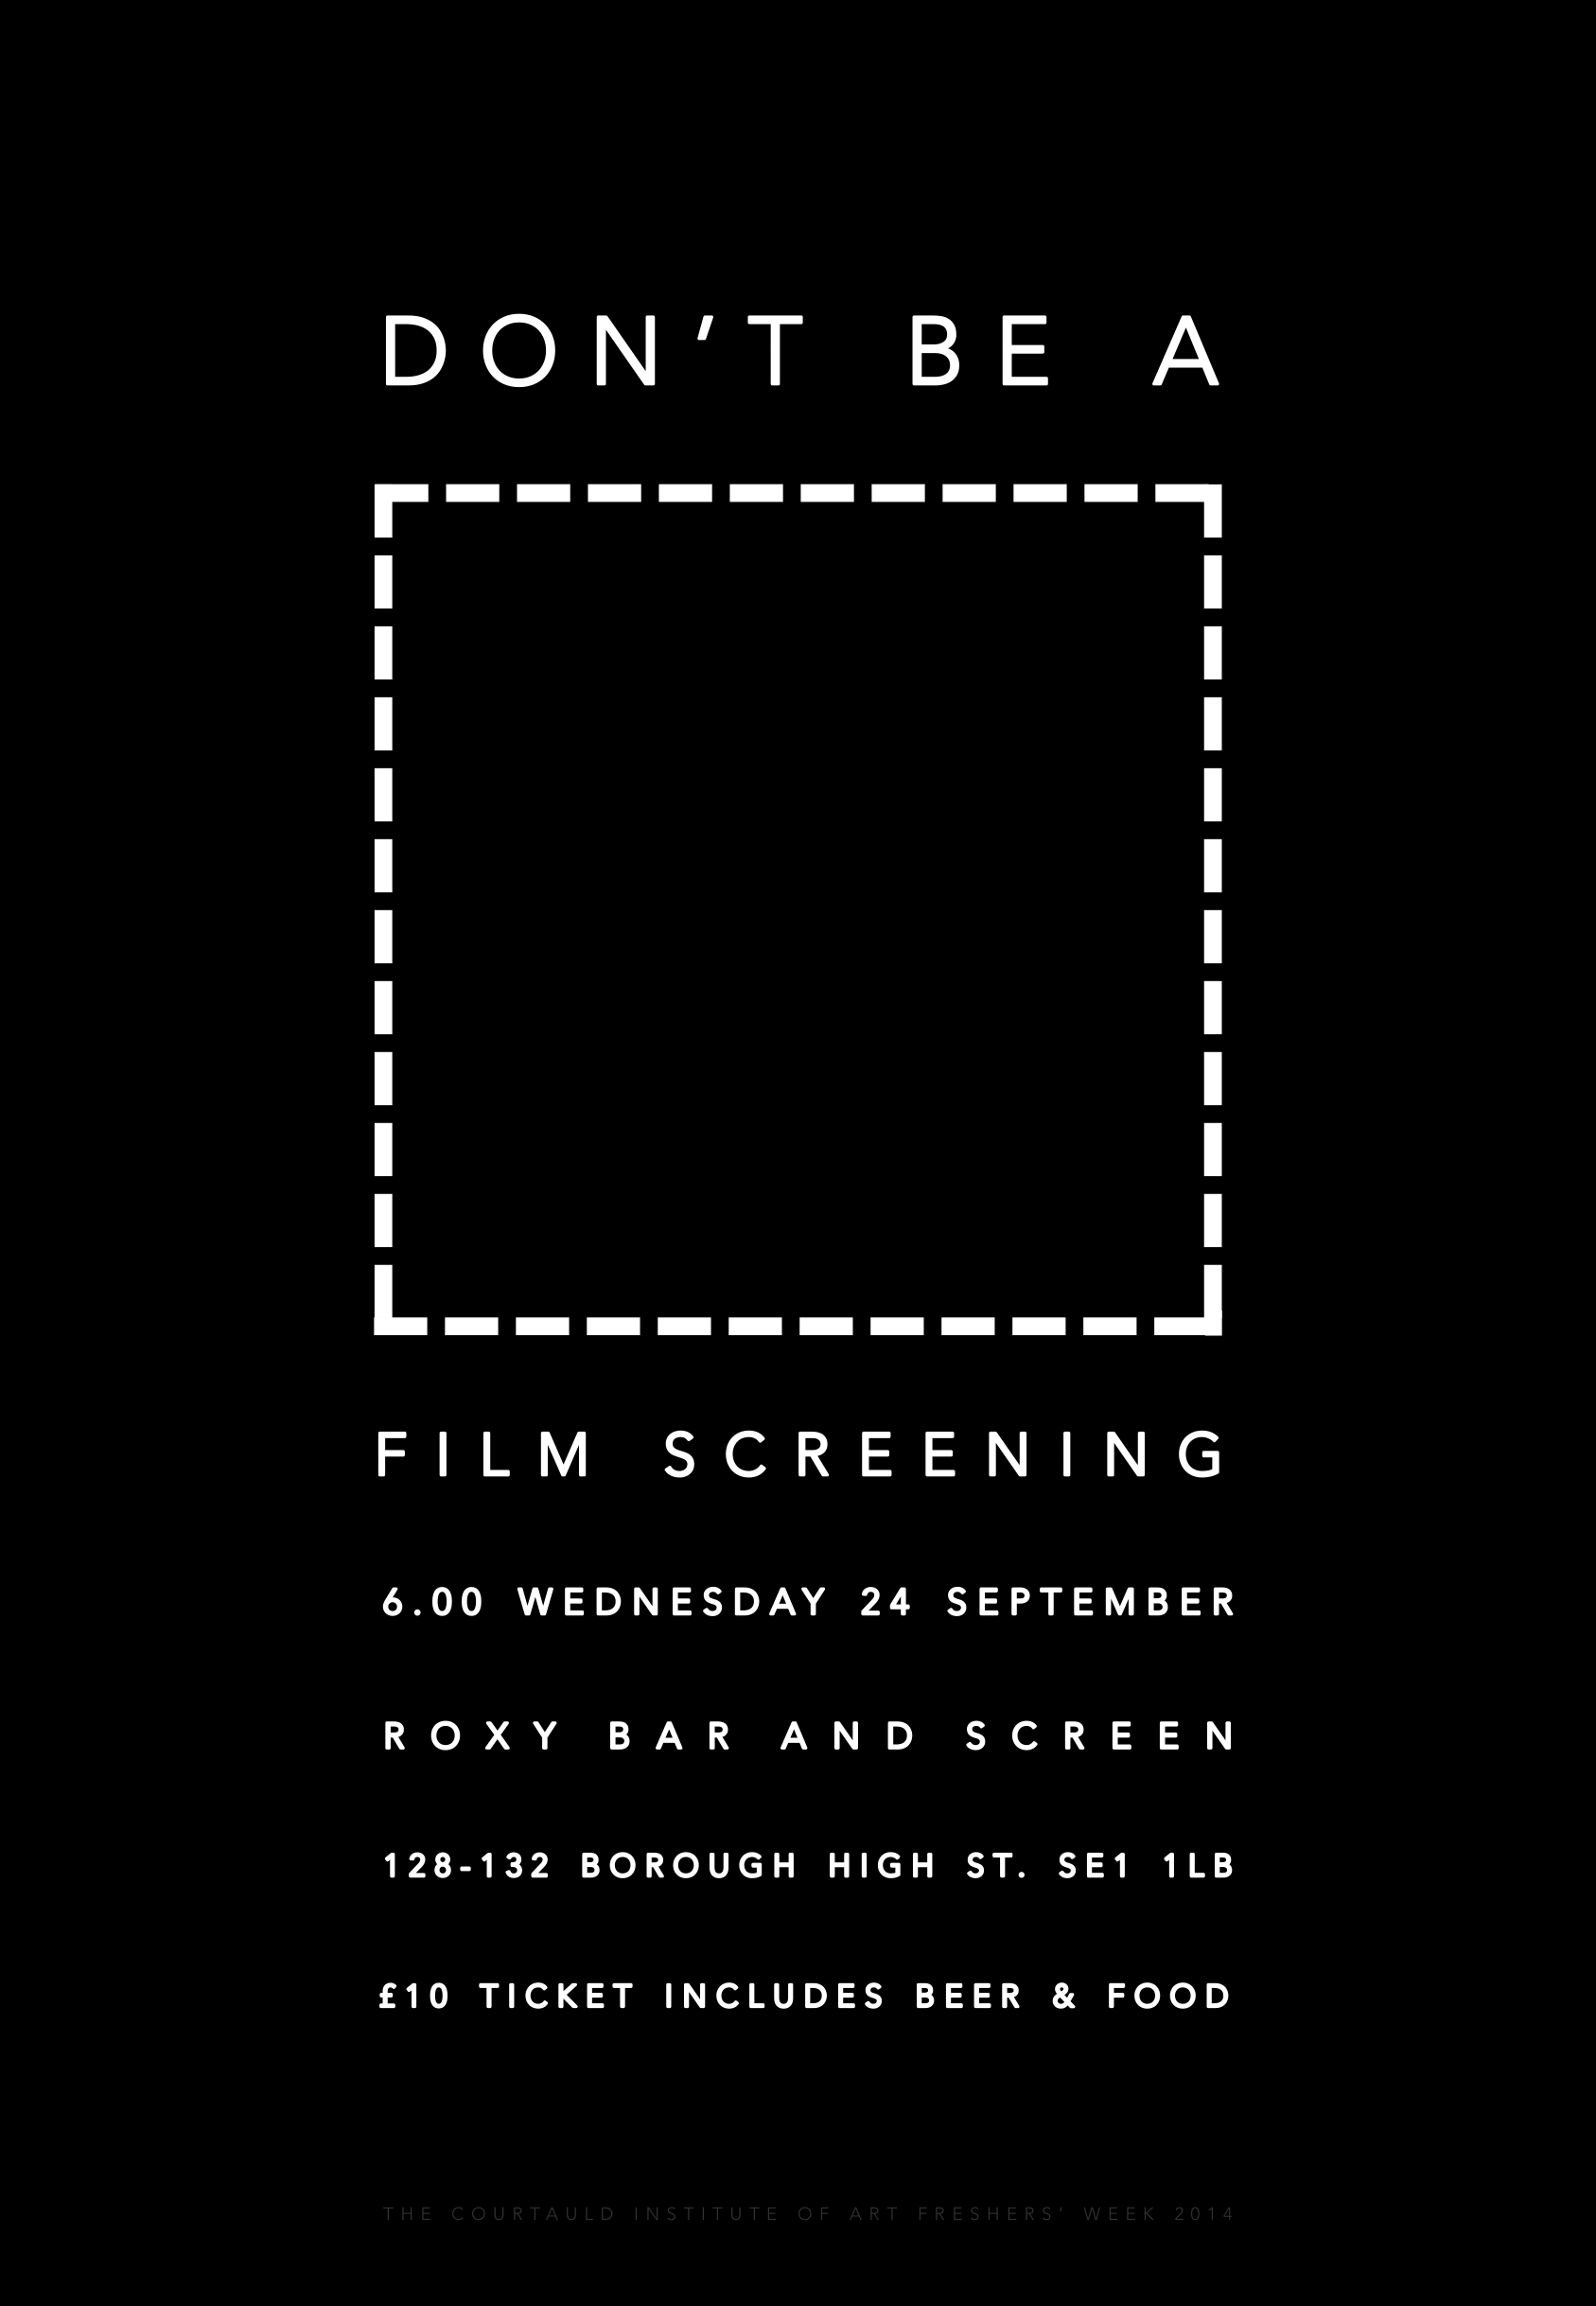 3 Wednesday - Cinema